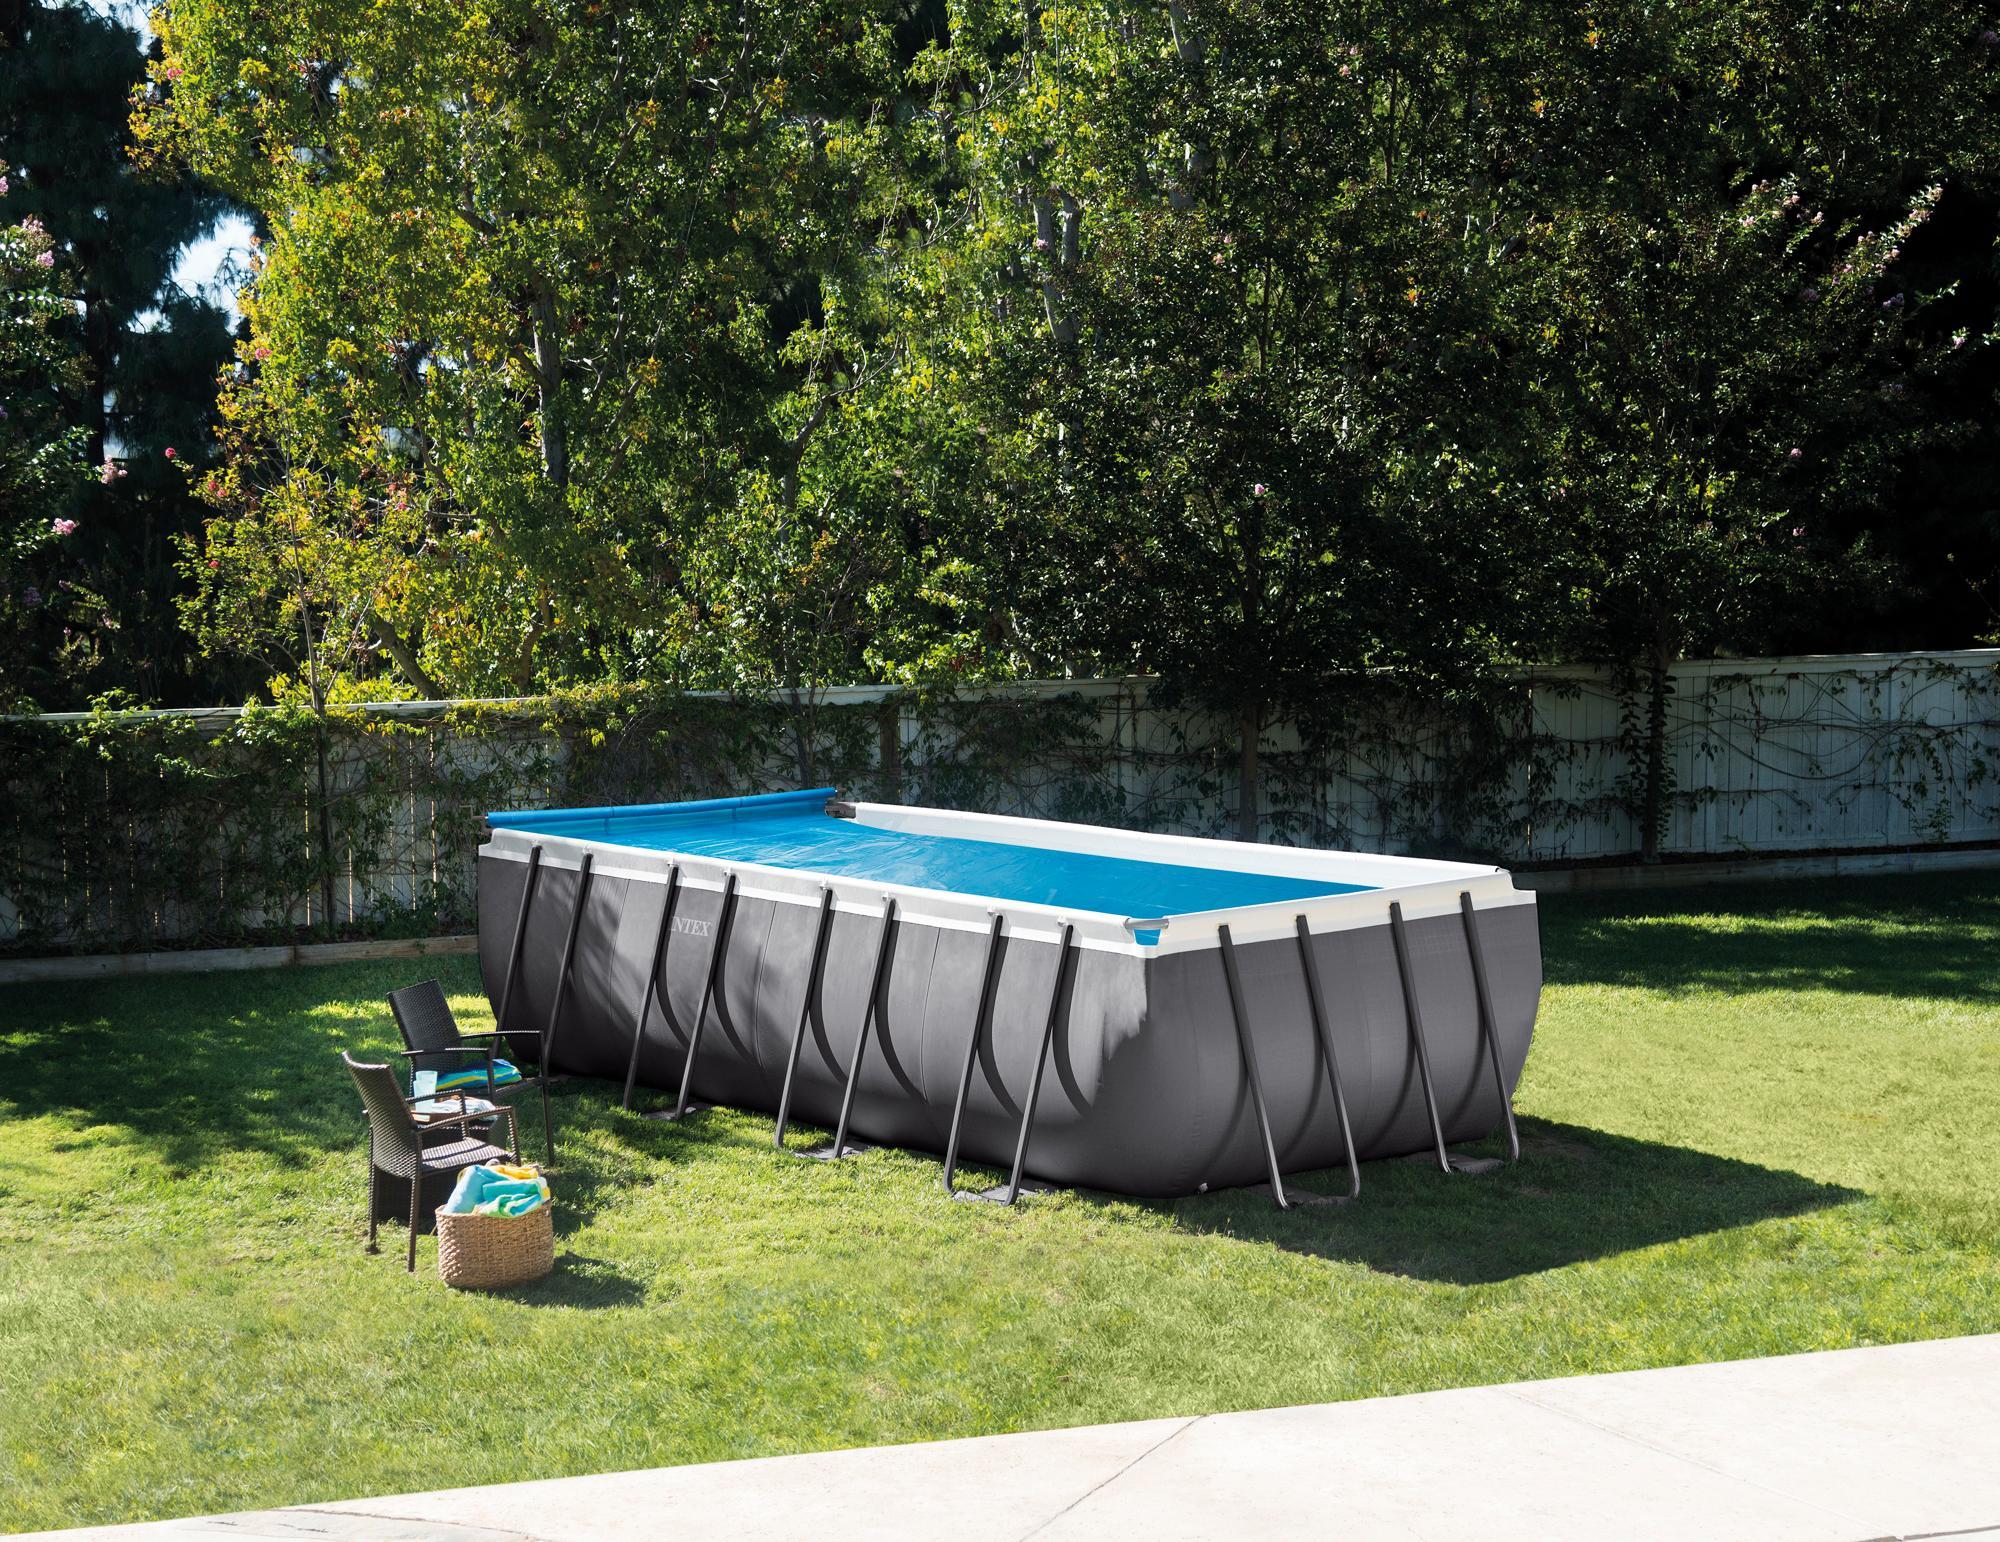 intex ultra frame pool 26352gn 549x274x132cm inkl rcd. Black Bedroom Furniture Sets. Home Design Ideas